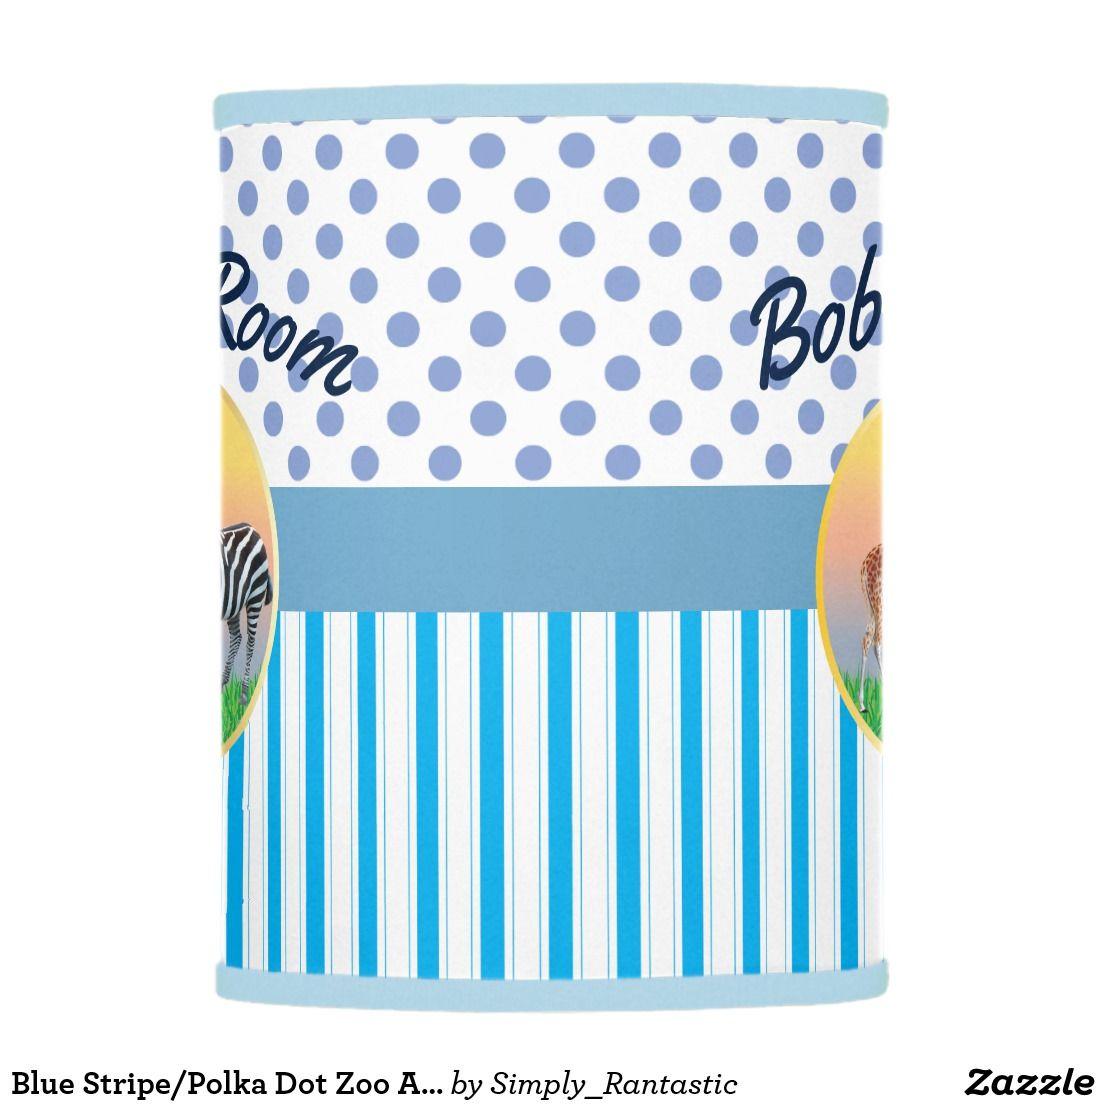 Blue Stripe/Polka Dot Zoo Animal Boys Room